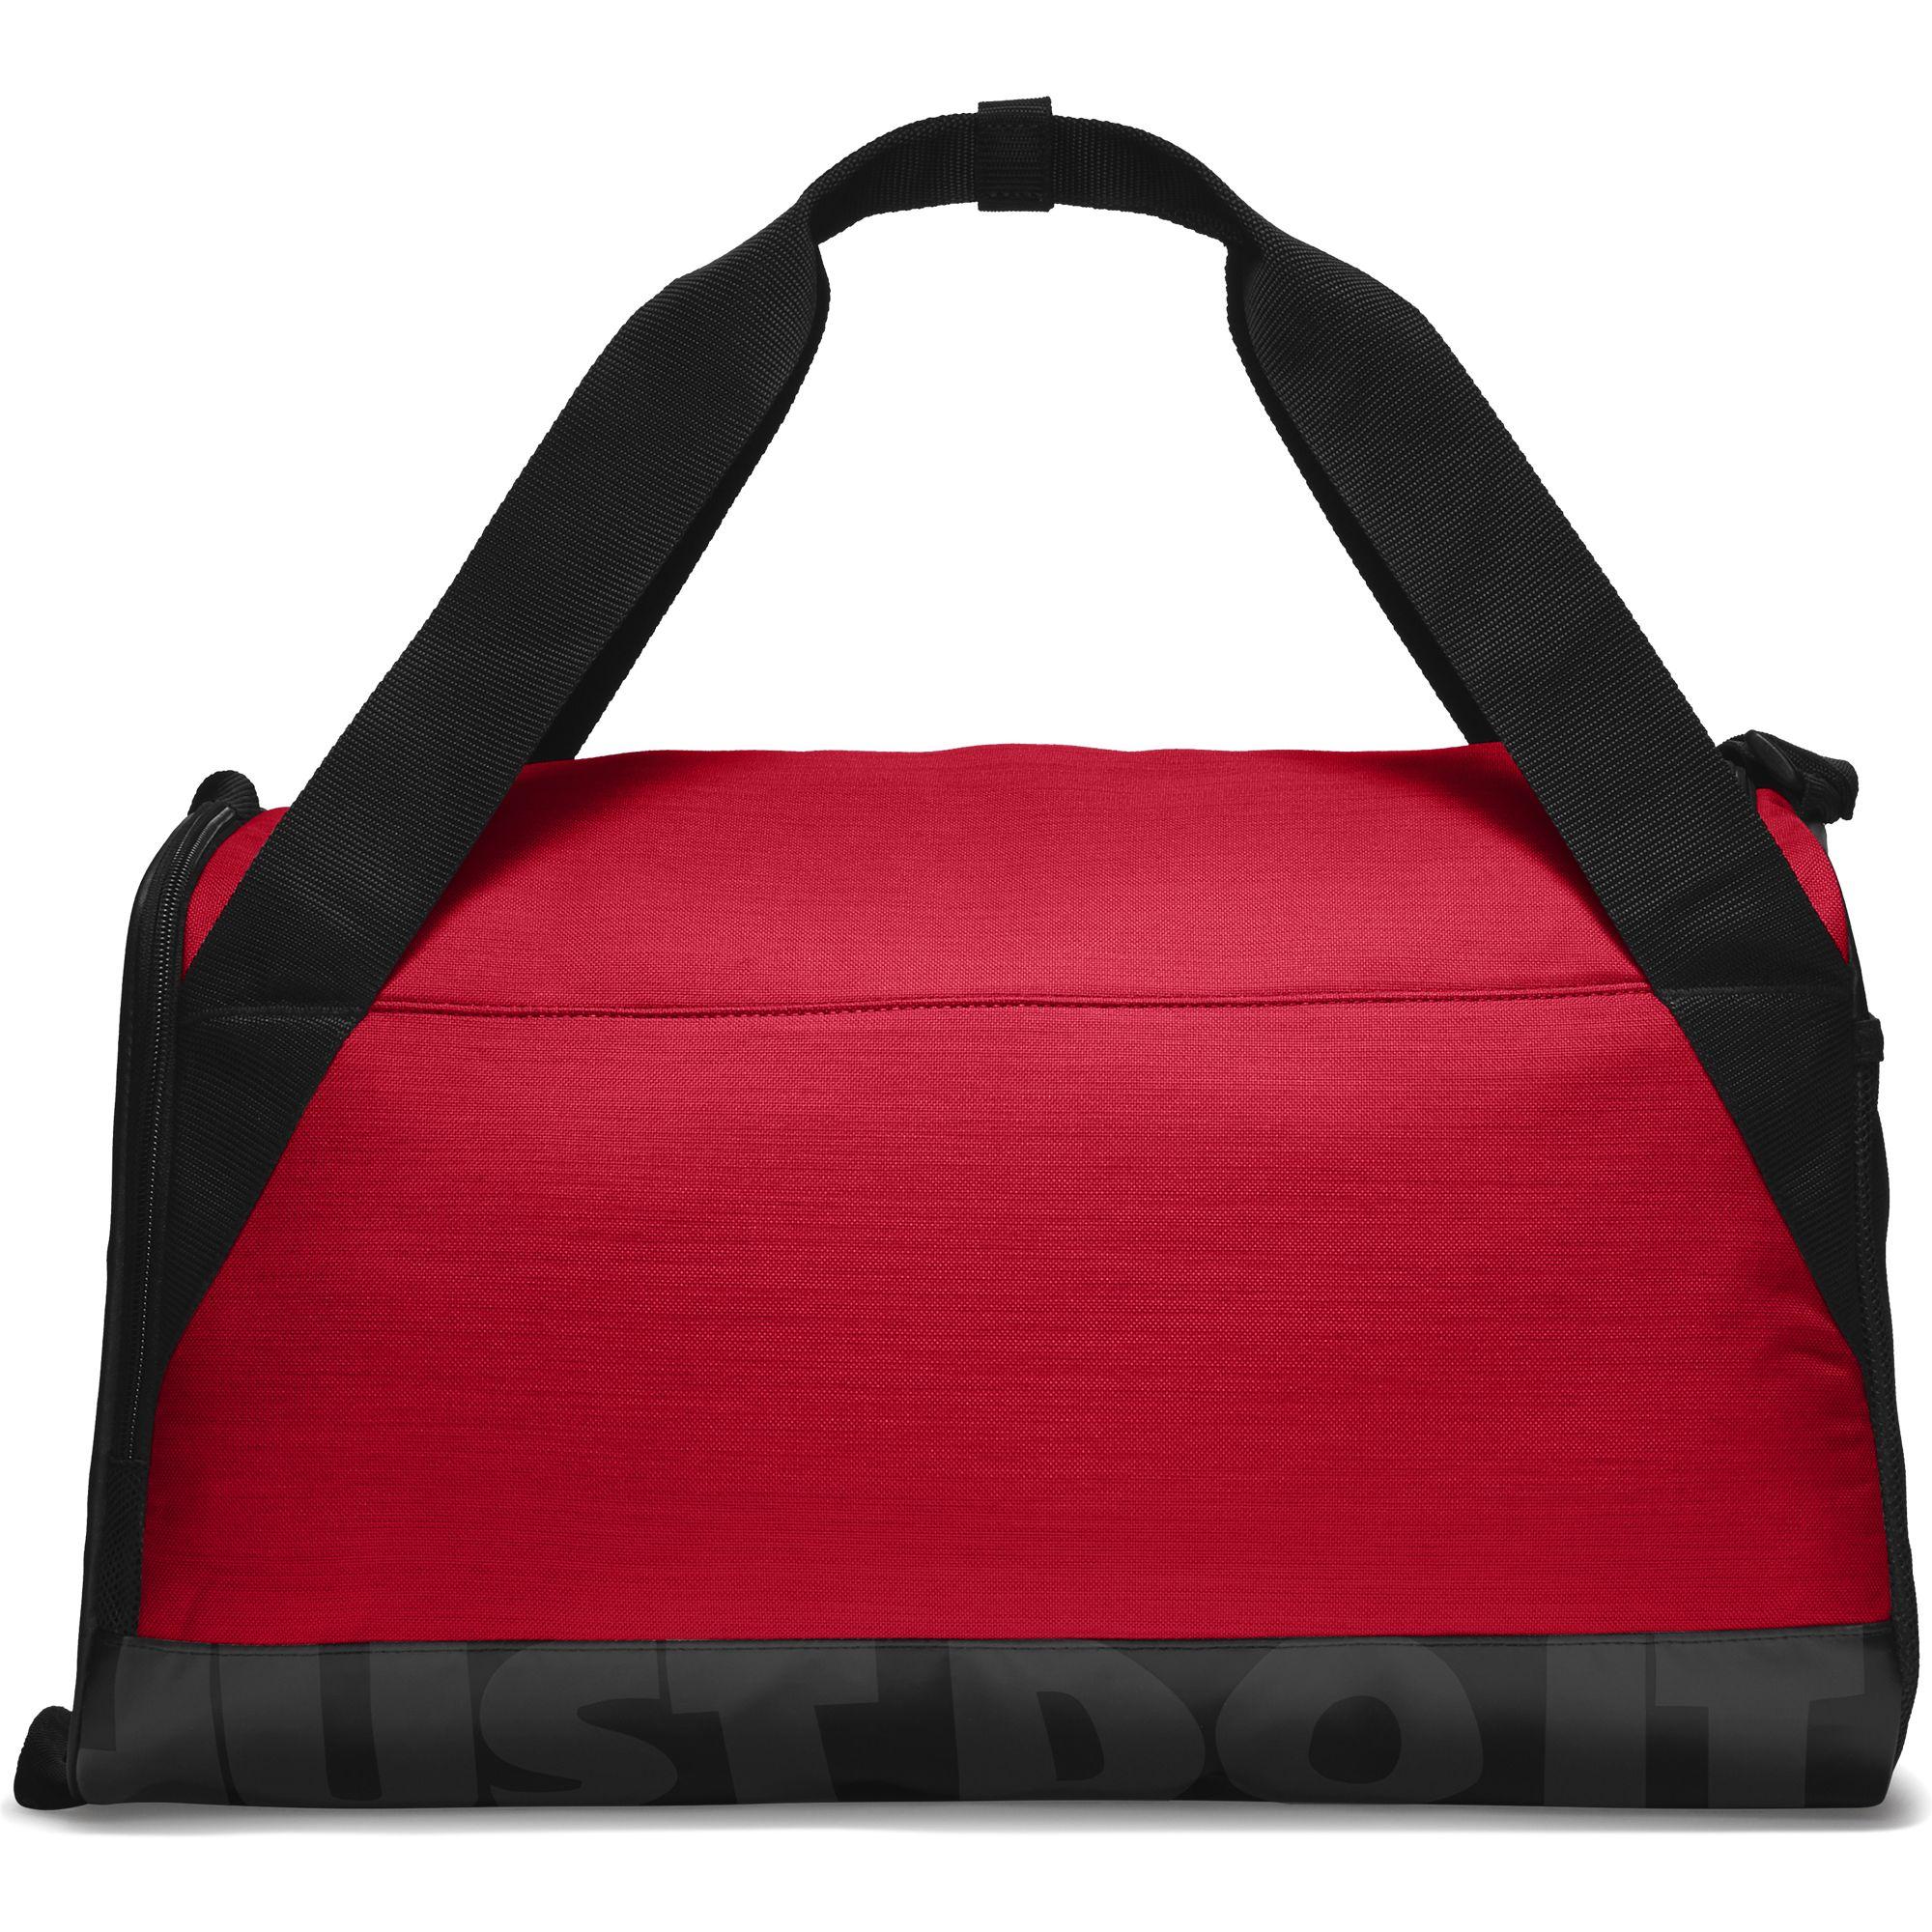 303062a489 ... torba Nike Brasilia (Small) Training Duffel Bag BA5335 657 ...